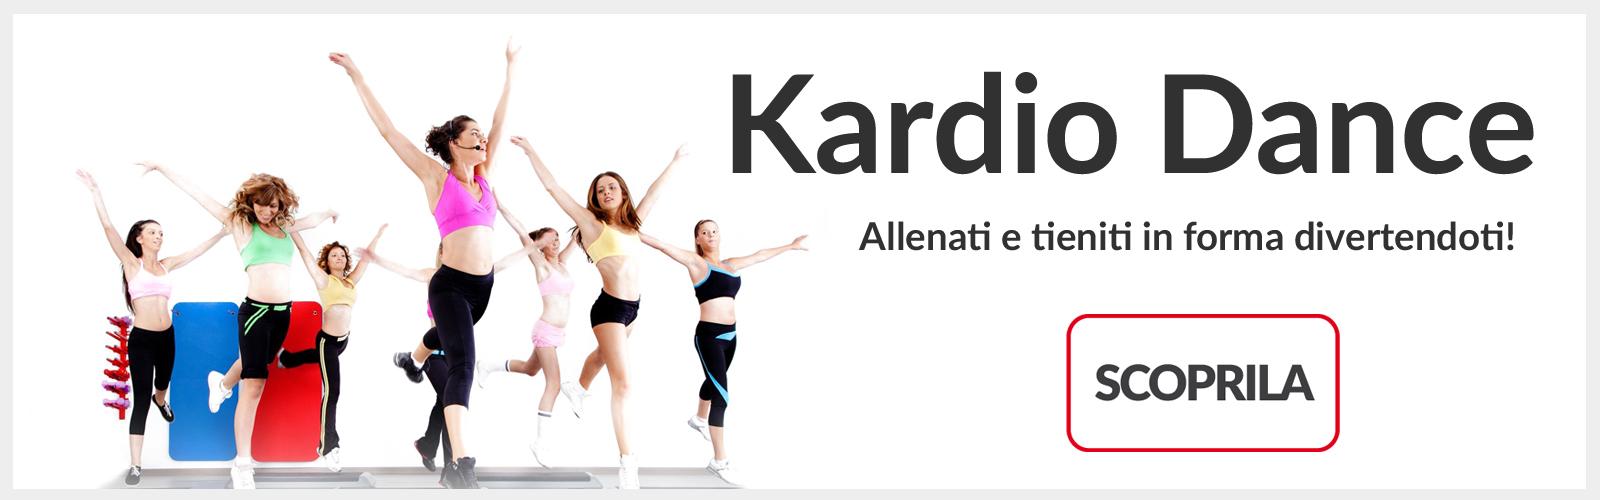 kardio-banner